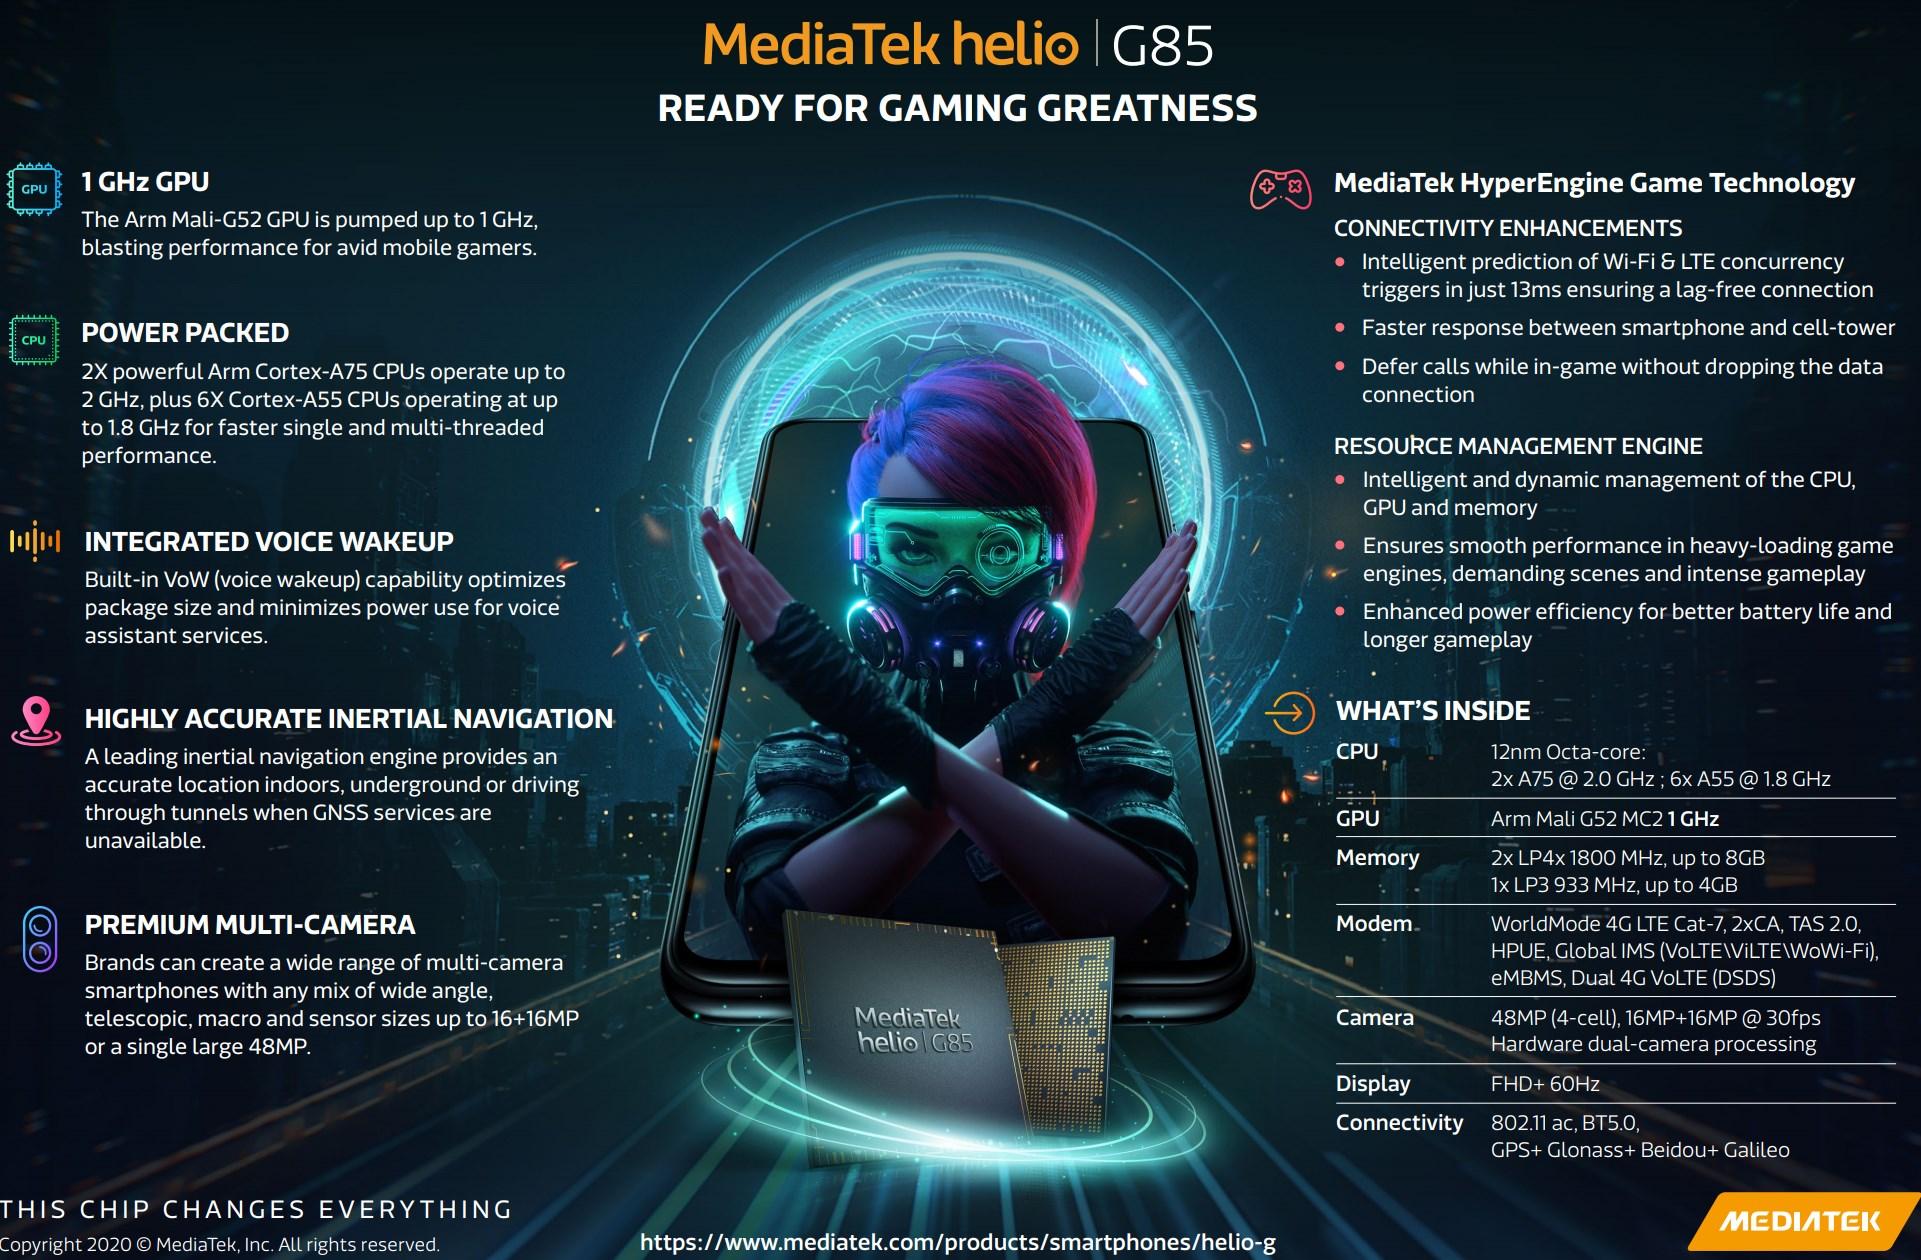 Презентация чипа Mediatek G85